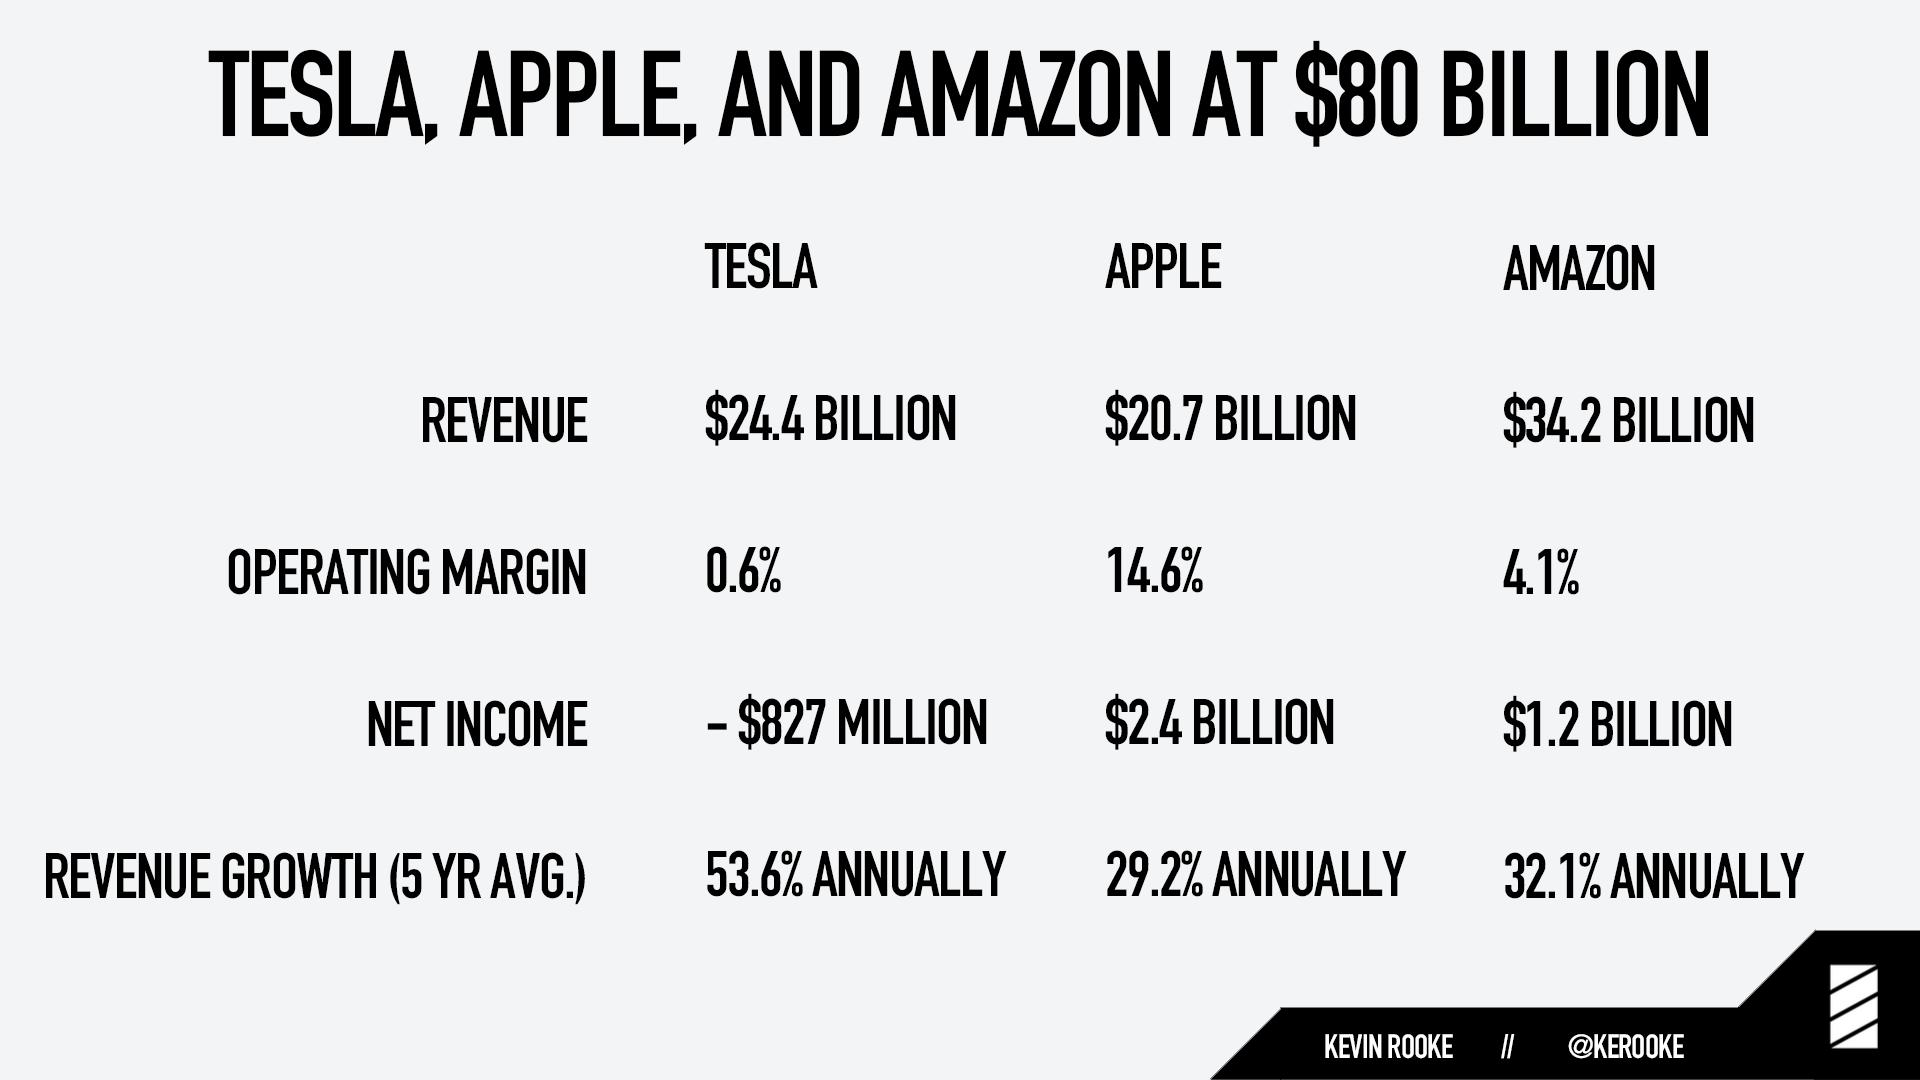 Tesla at $80 billion market cap vs Apple and Amazon at $80 billion